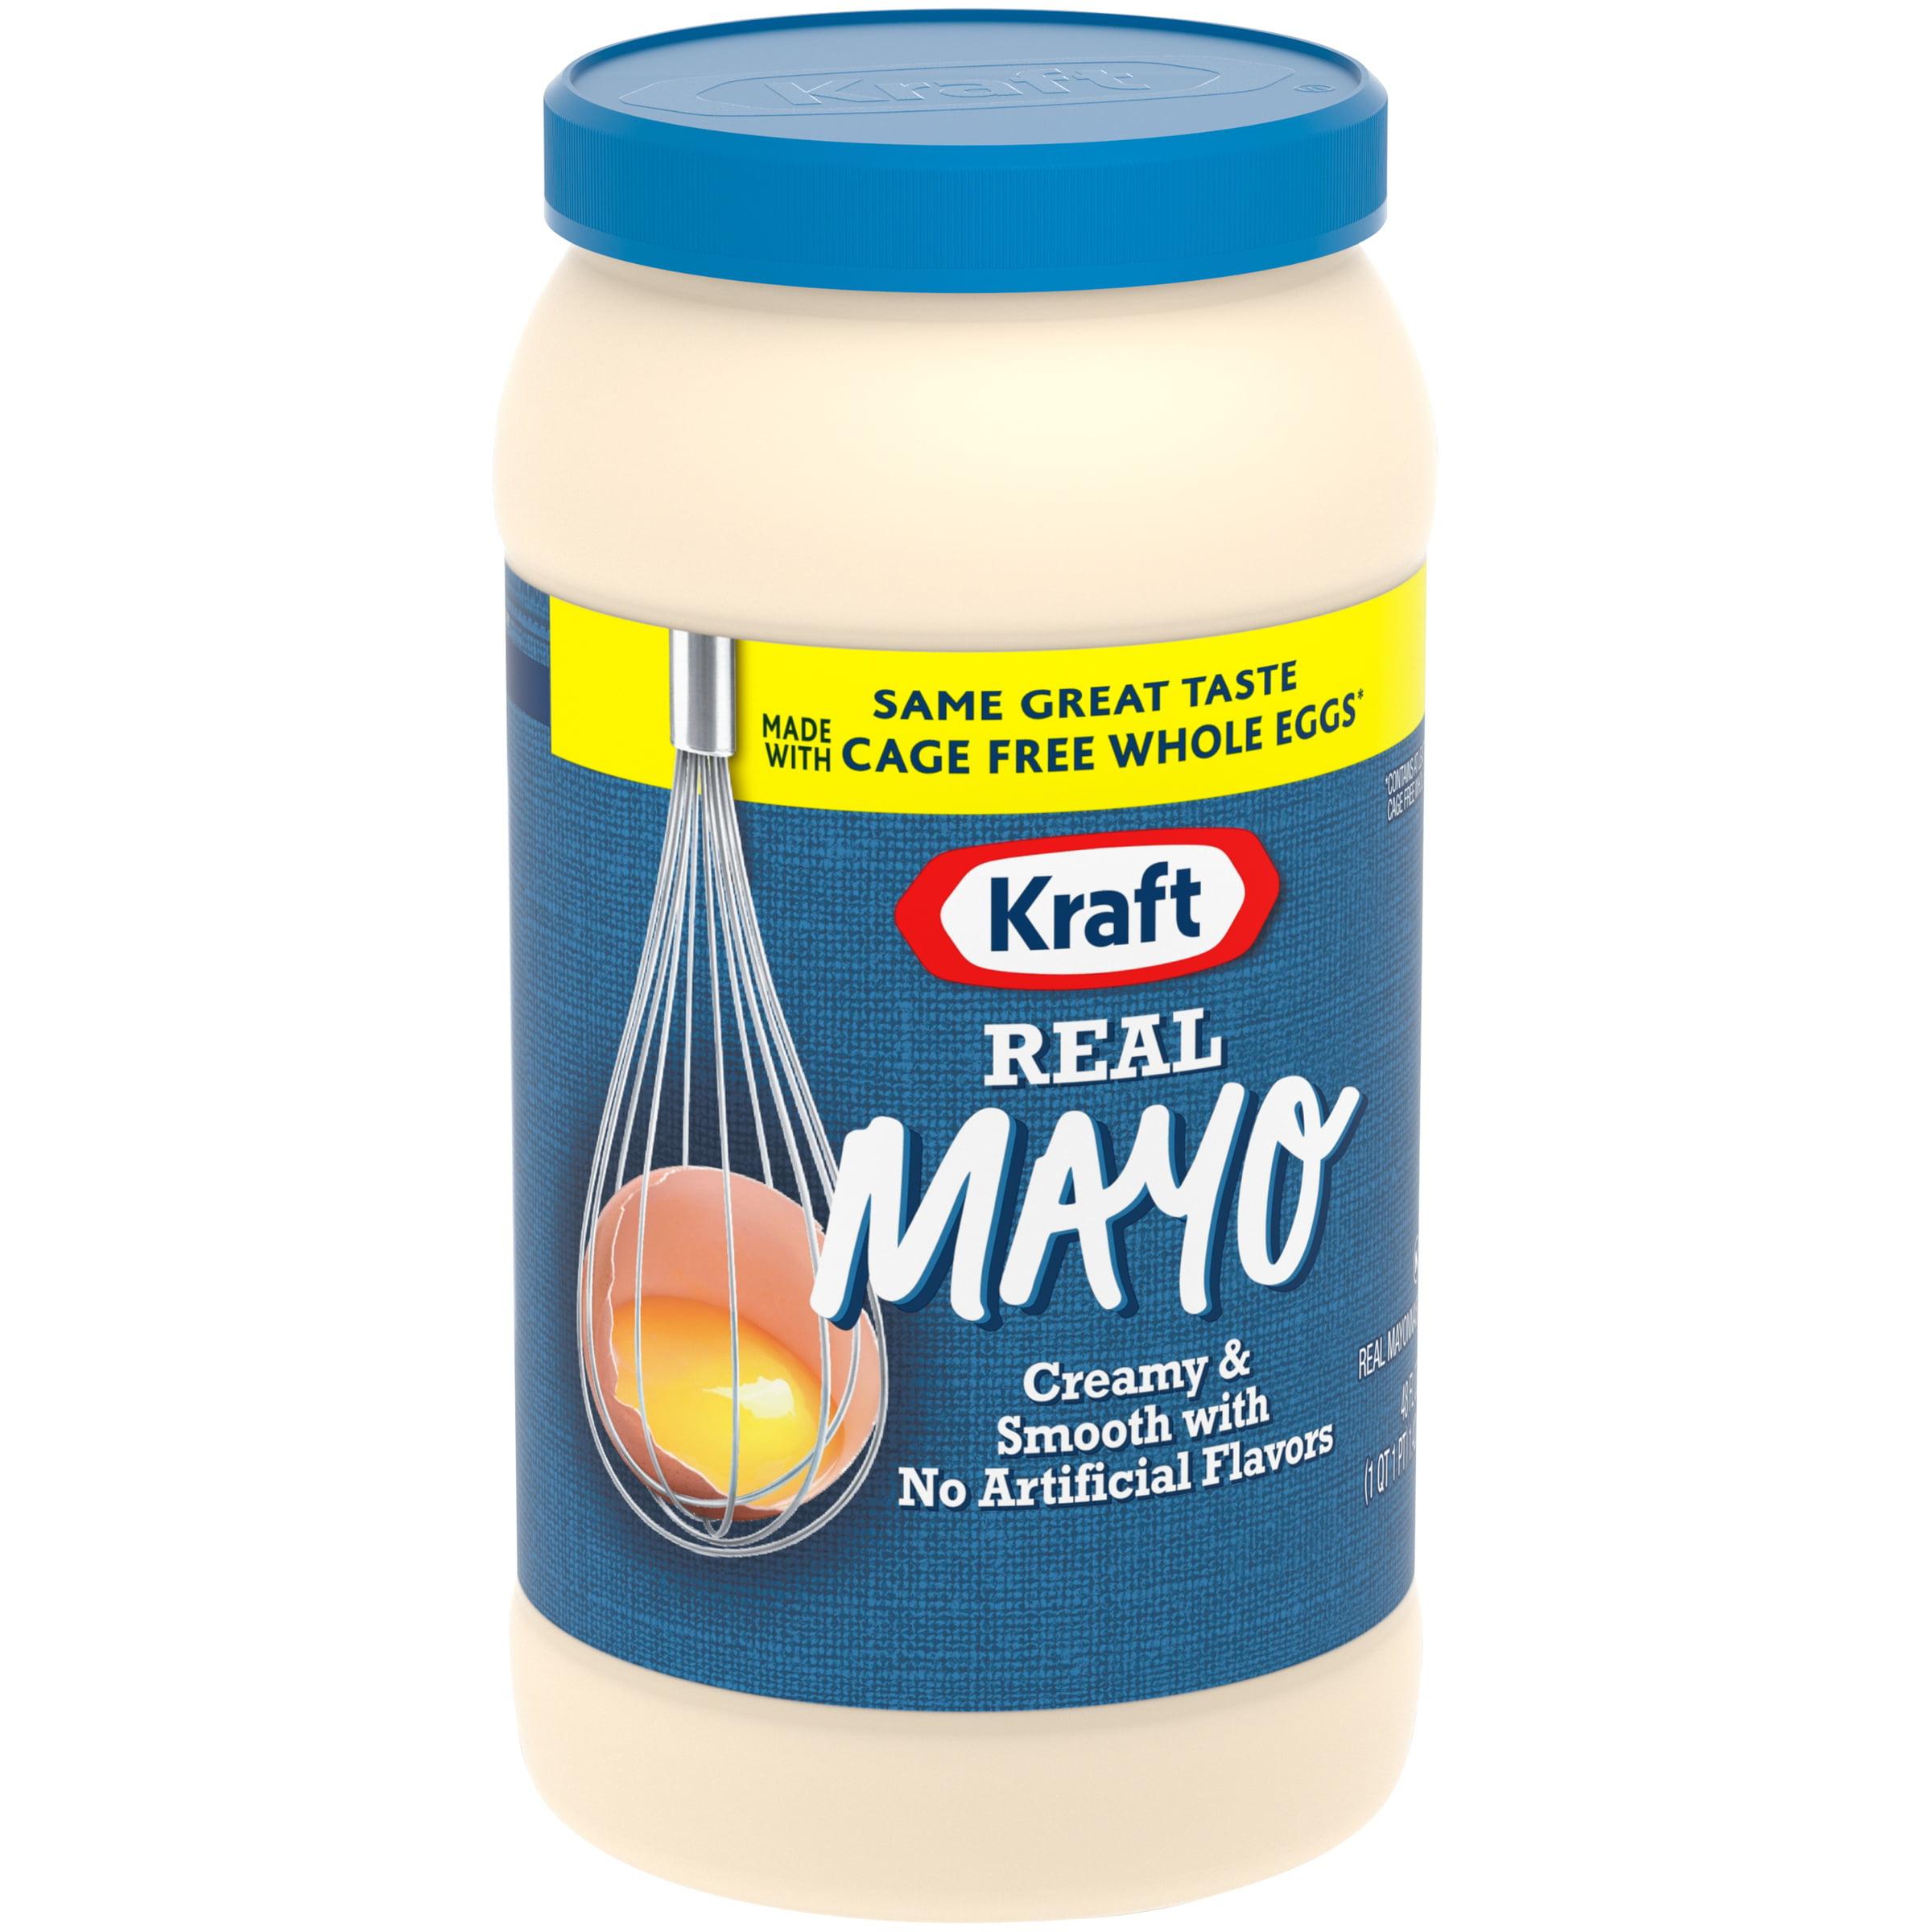 Kraft Mayo Mayonnaise Real, 48 fl oz, Jar